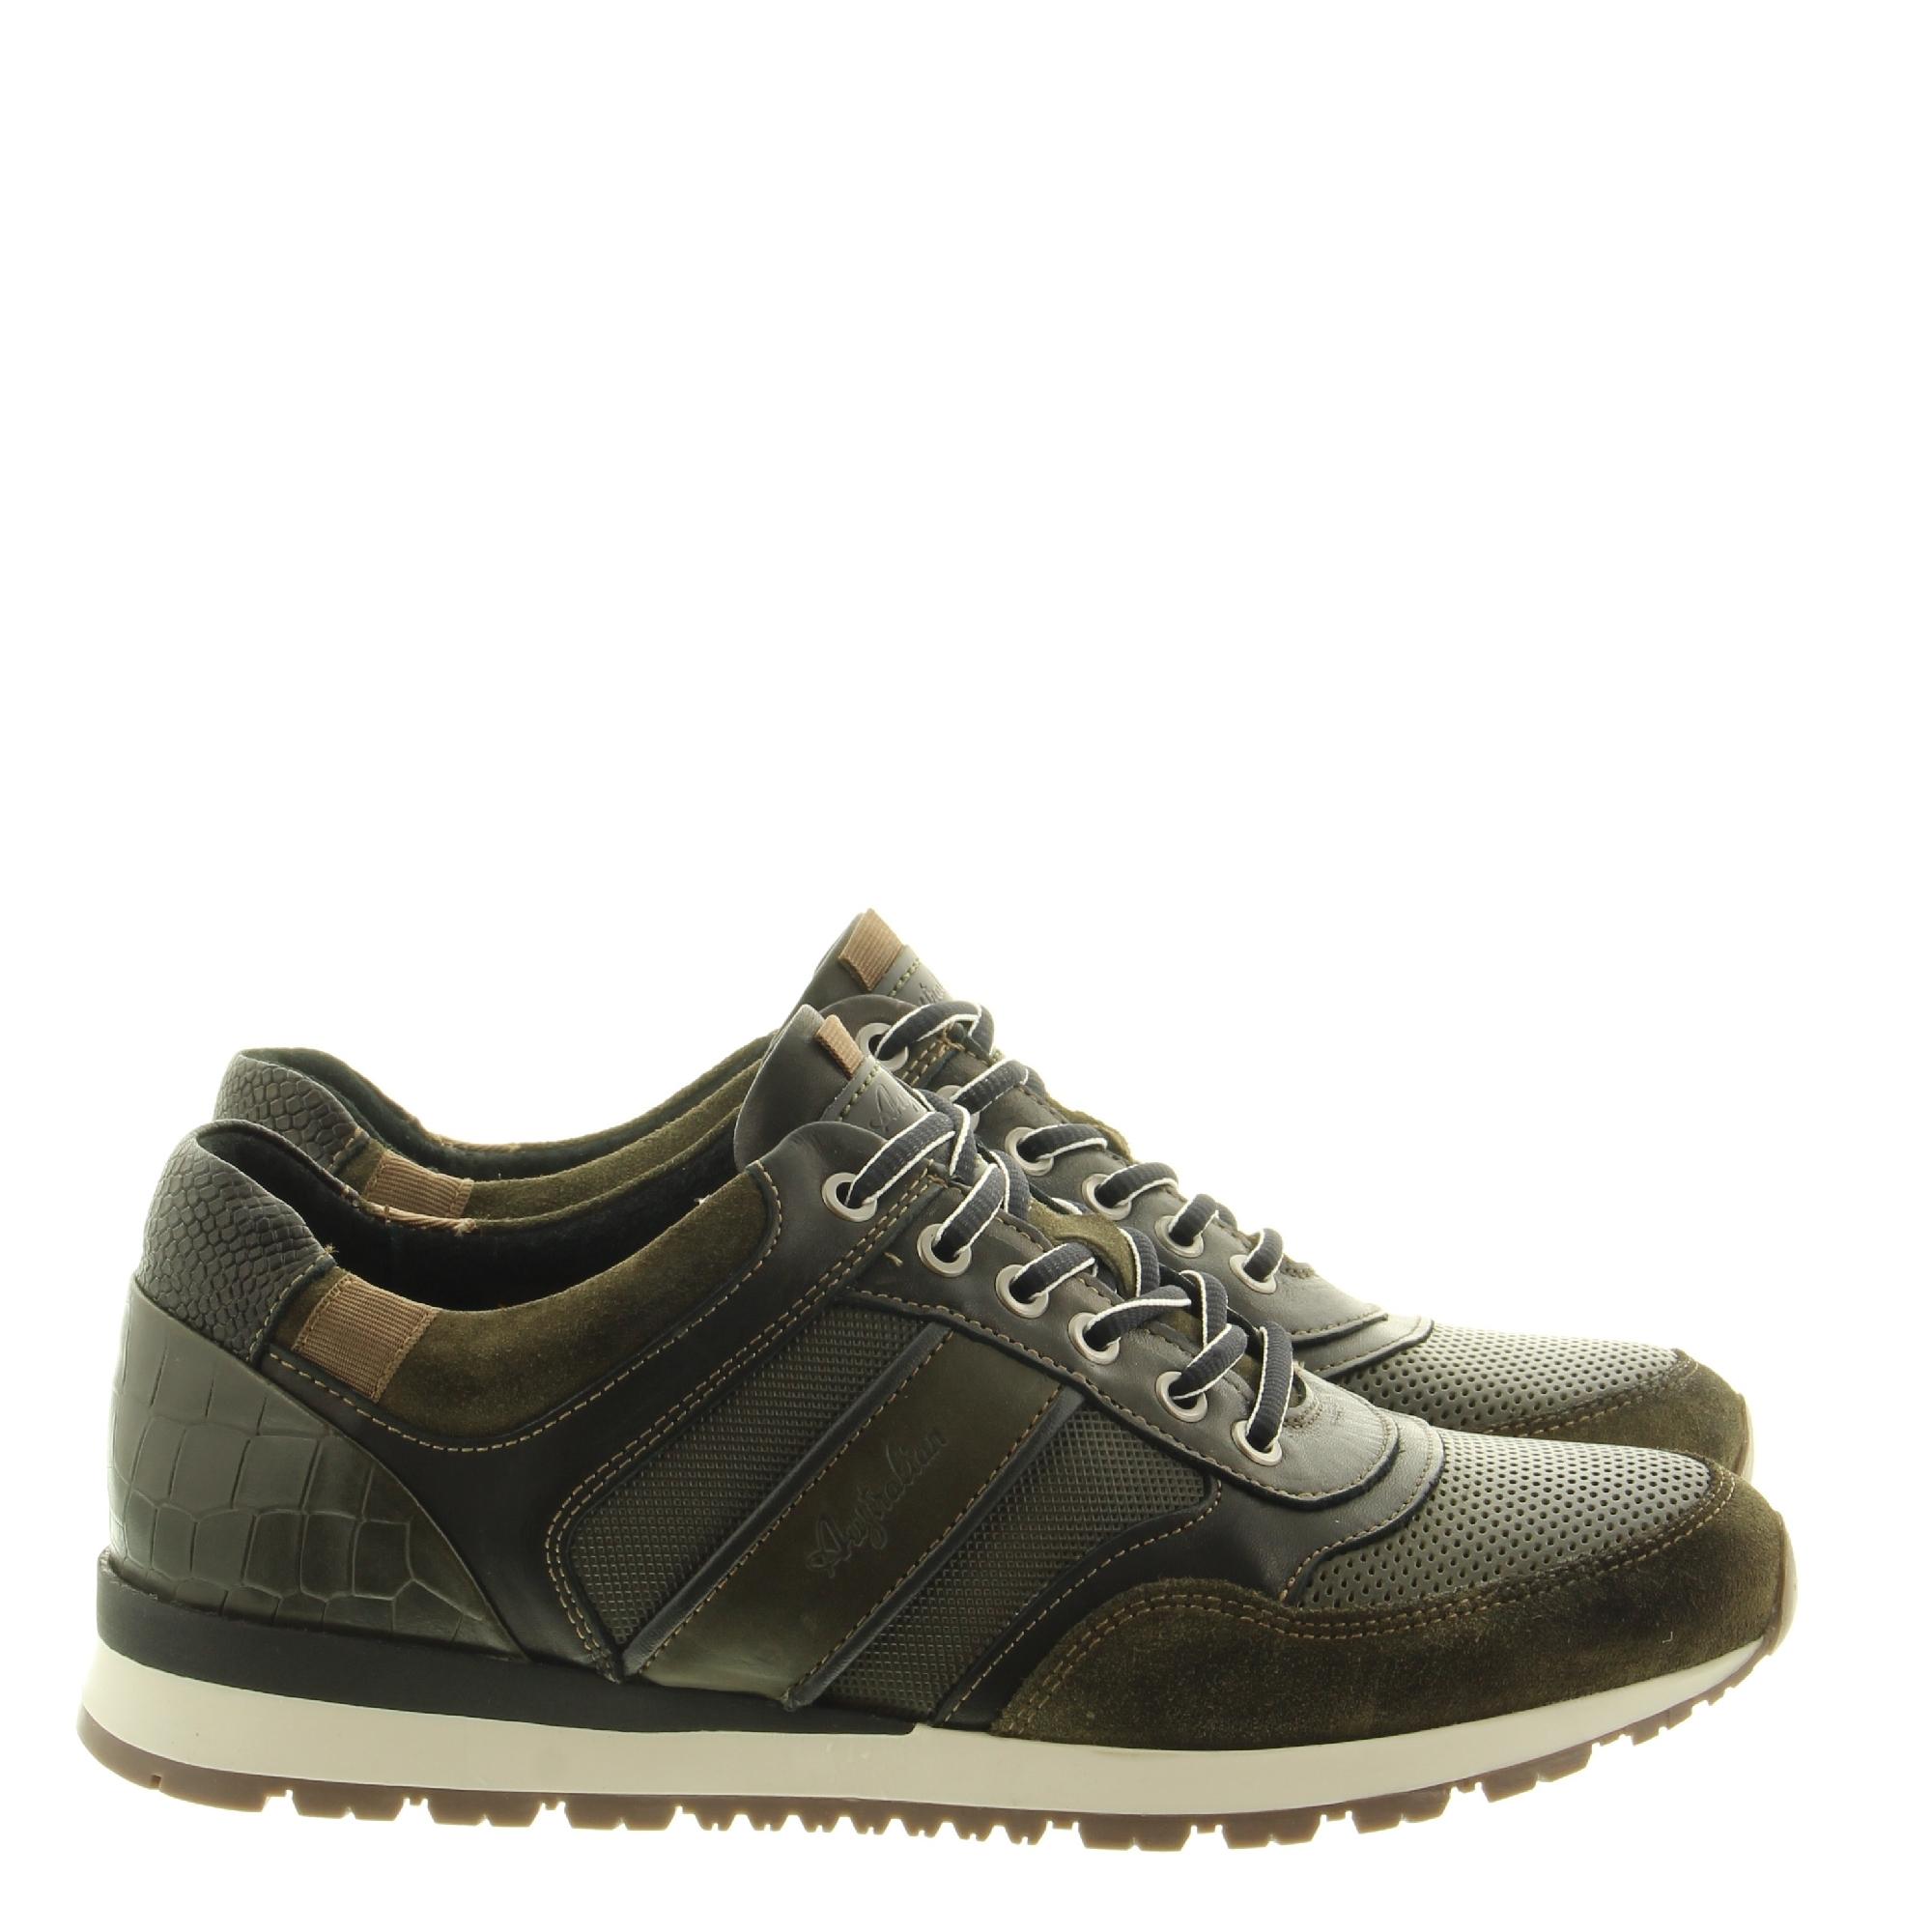 Australian Footwear Navarone 15.1470.02 ECJ Dark Green Black